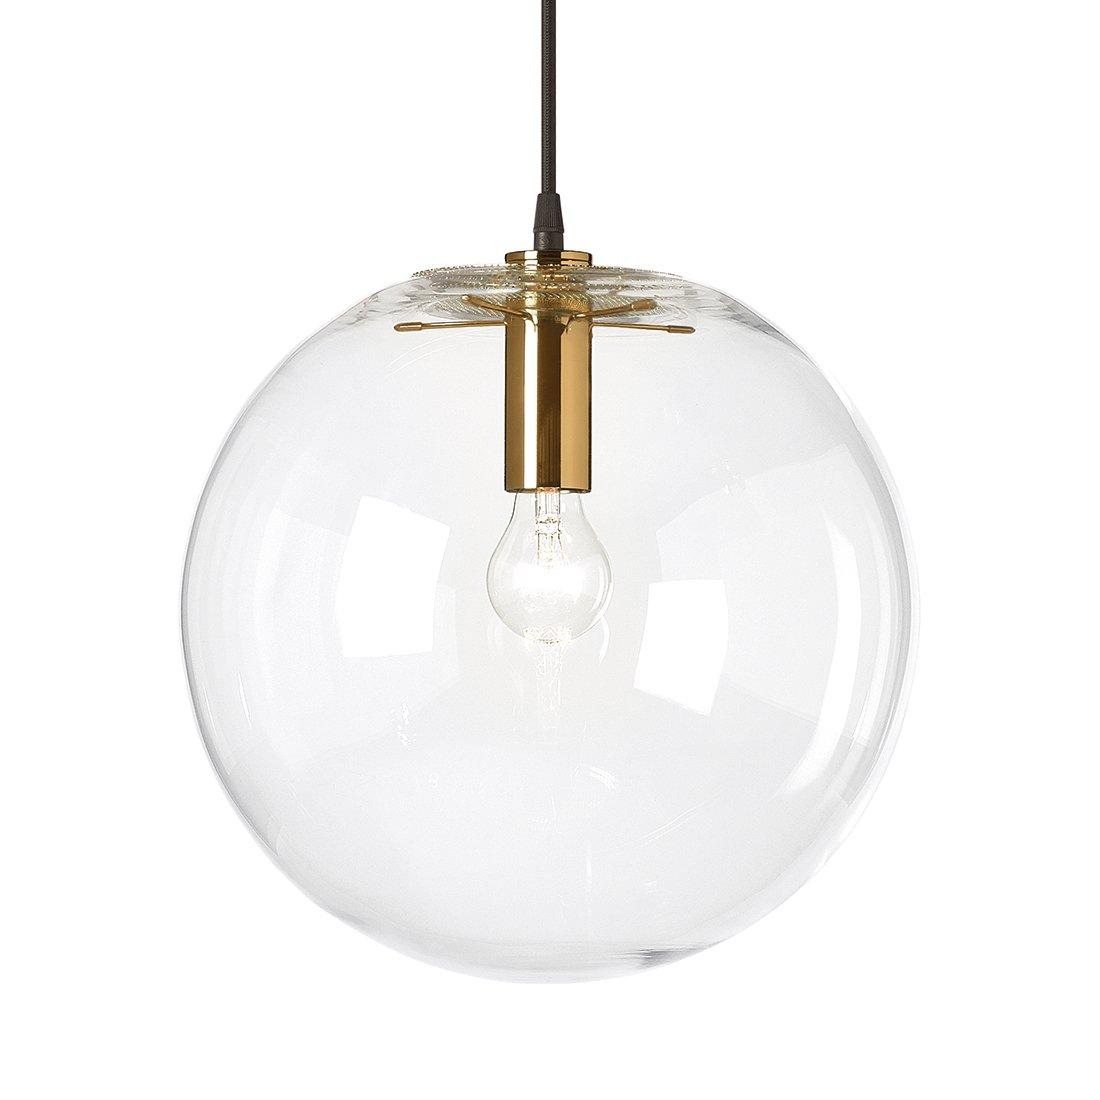 ClassiCon Selene Hanglamp Messing - �45 cm.